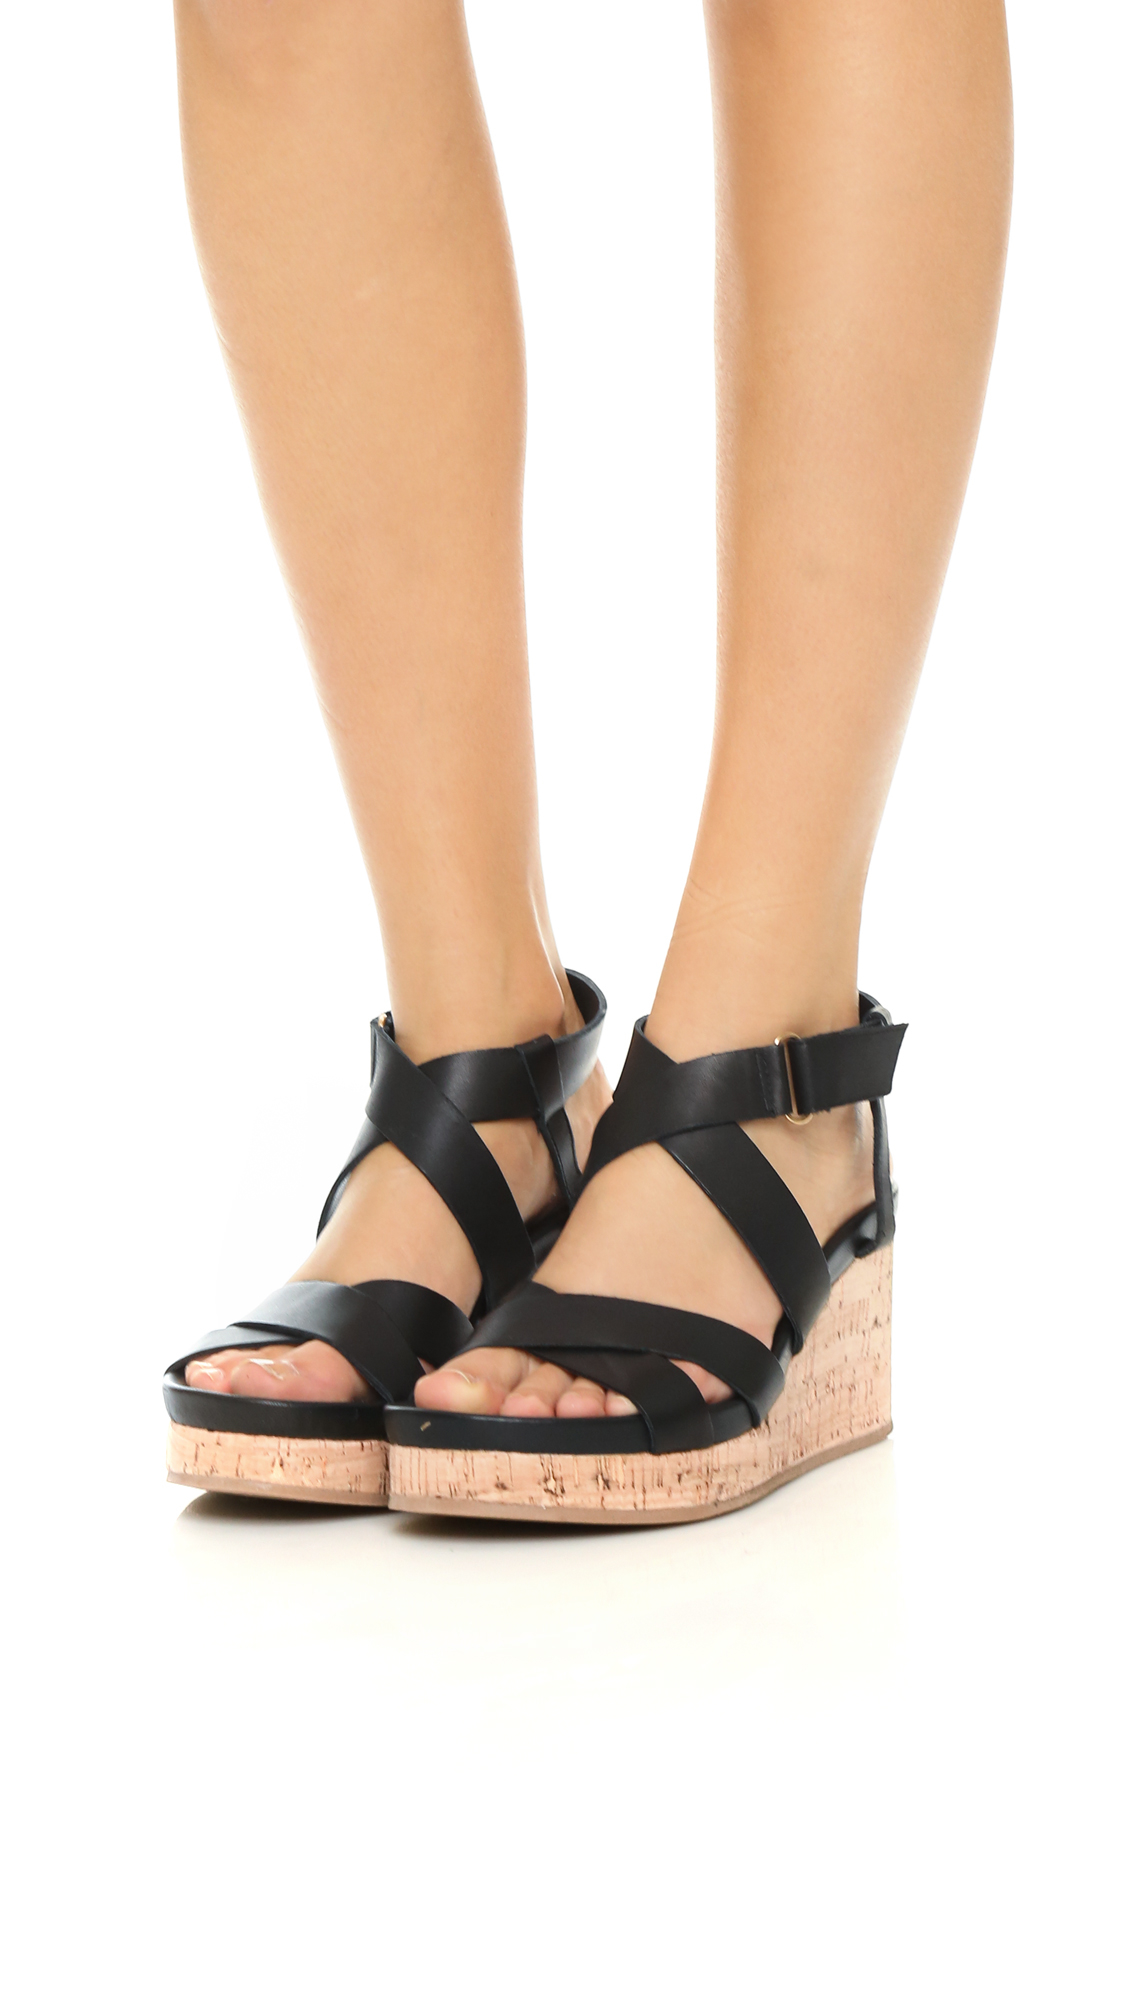 Lyst Dkny Lani Cork Wedge Sandals Black In Black